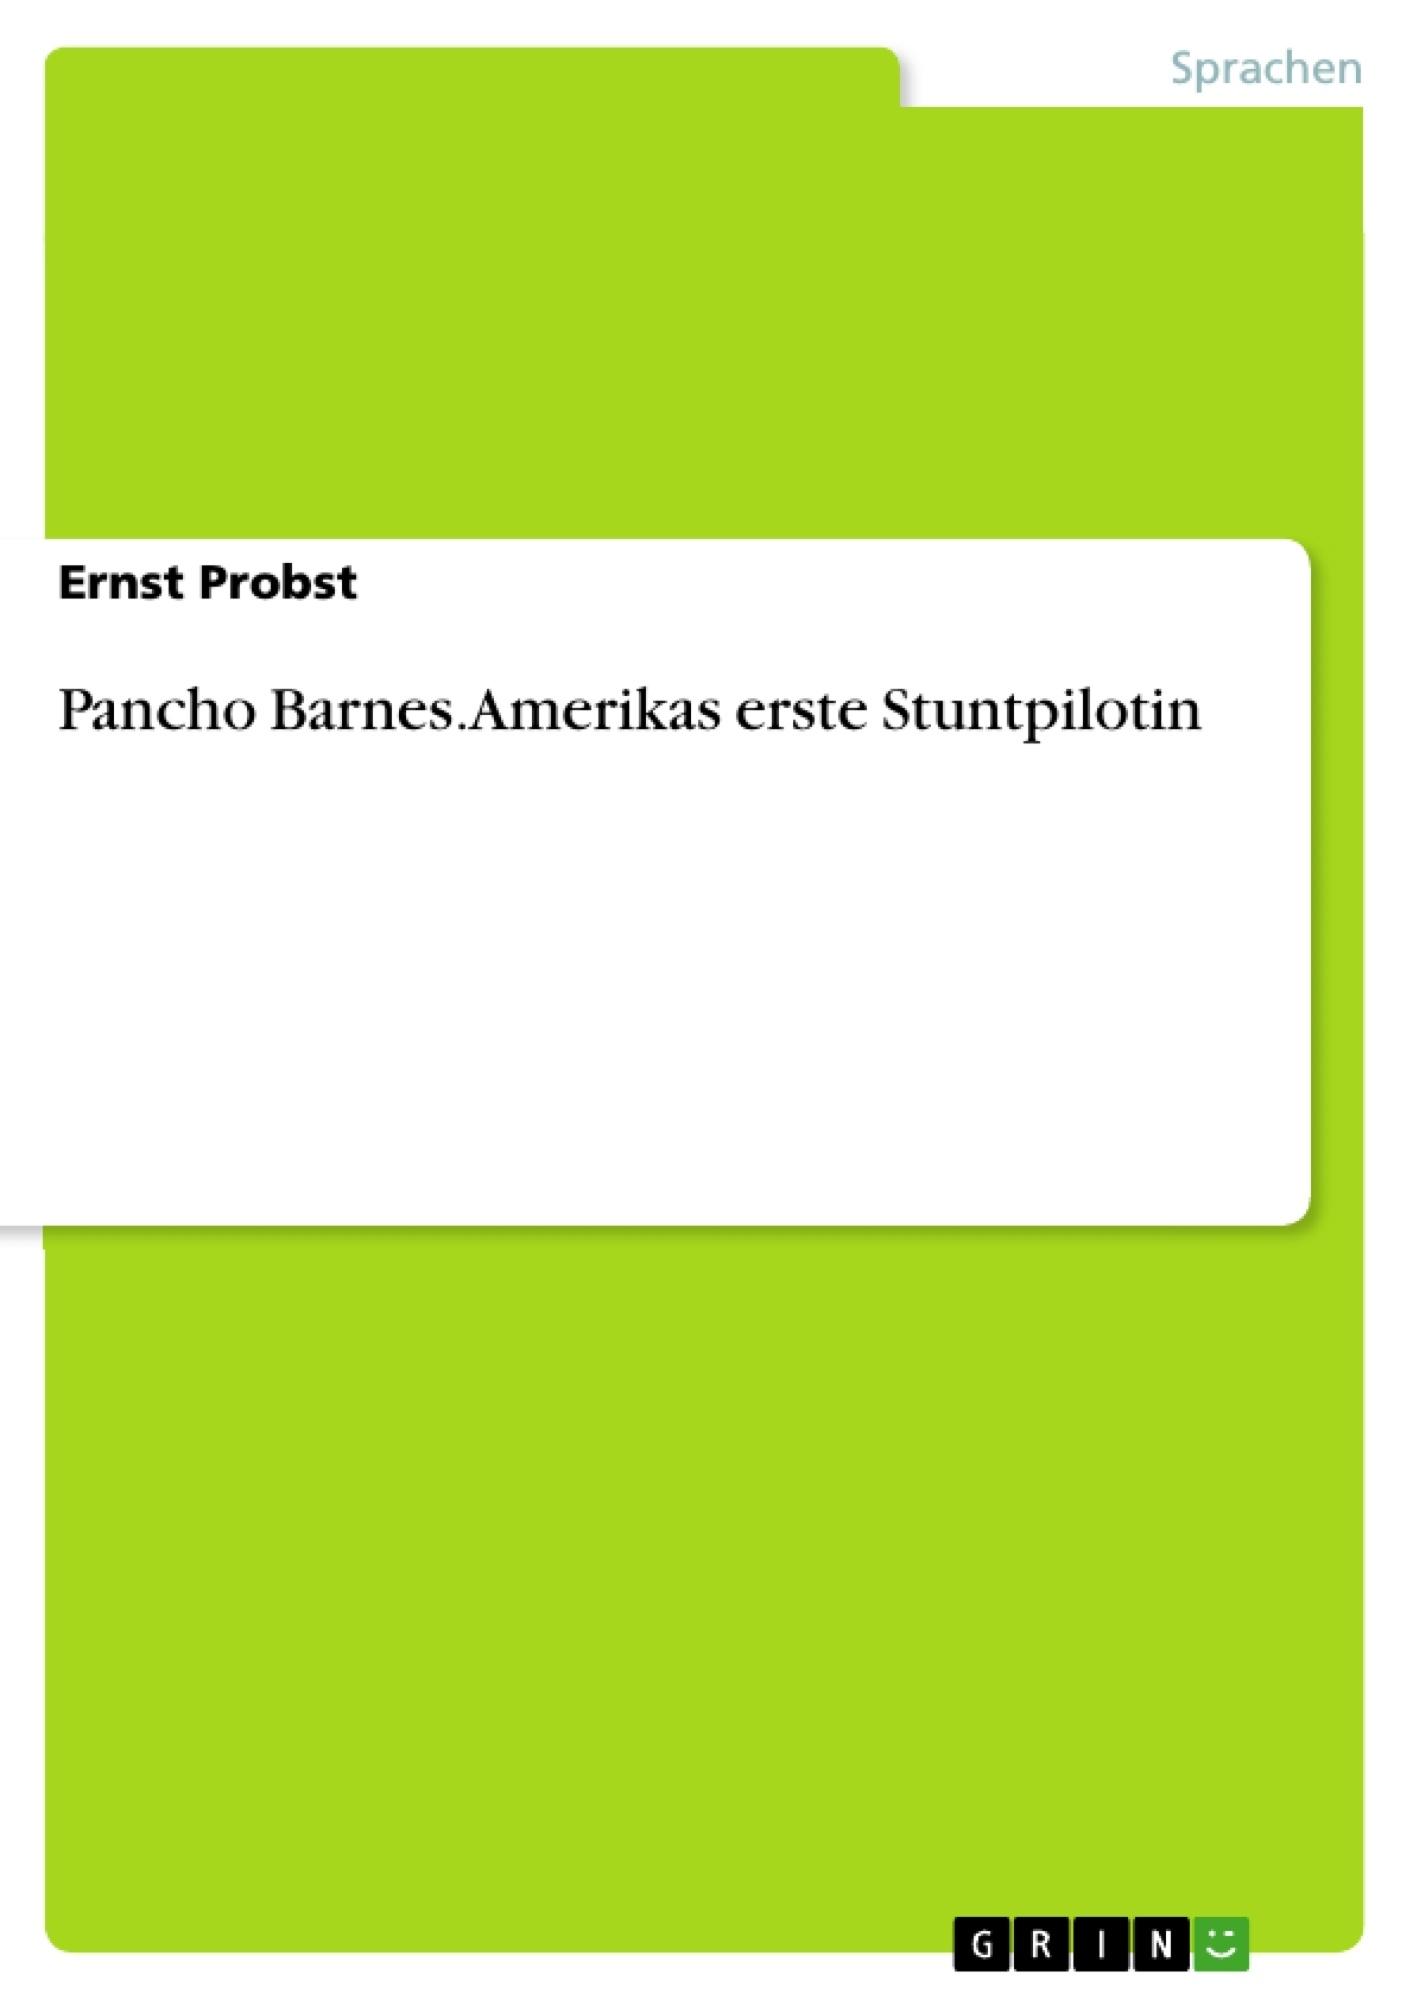 Titel: Pancho Barnes. Amerikas erste Stuntpilotin